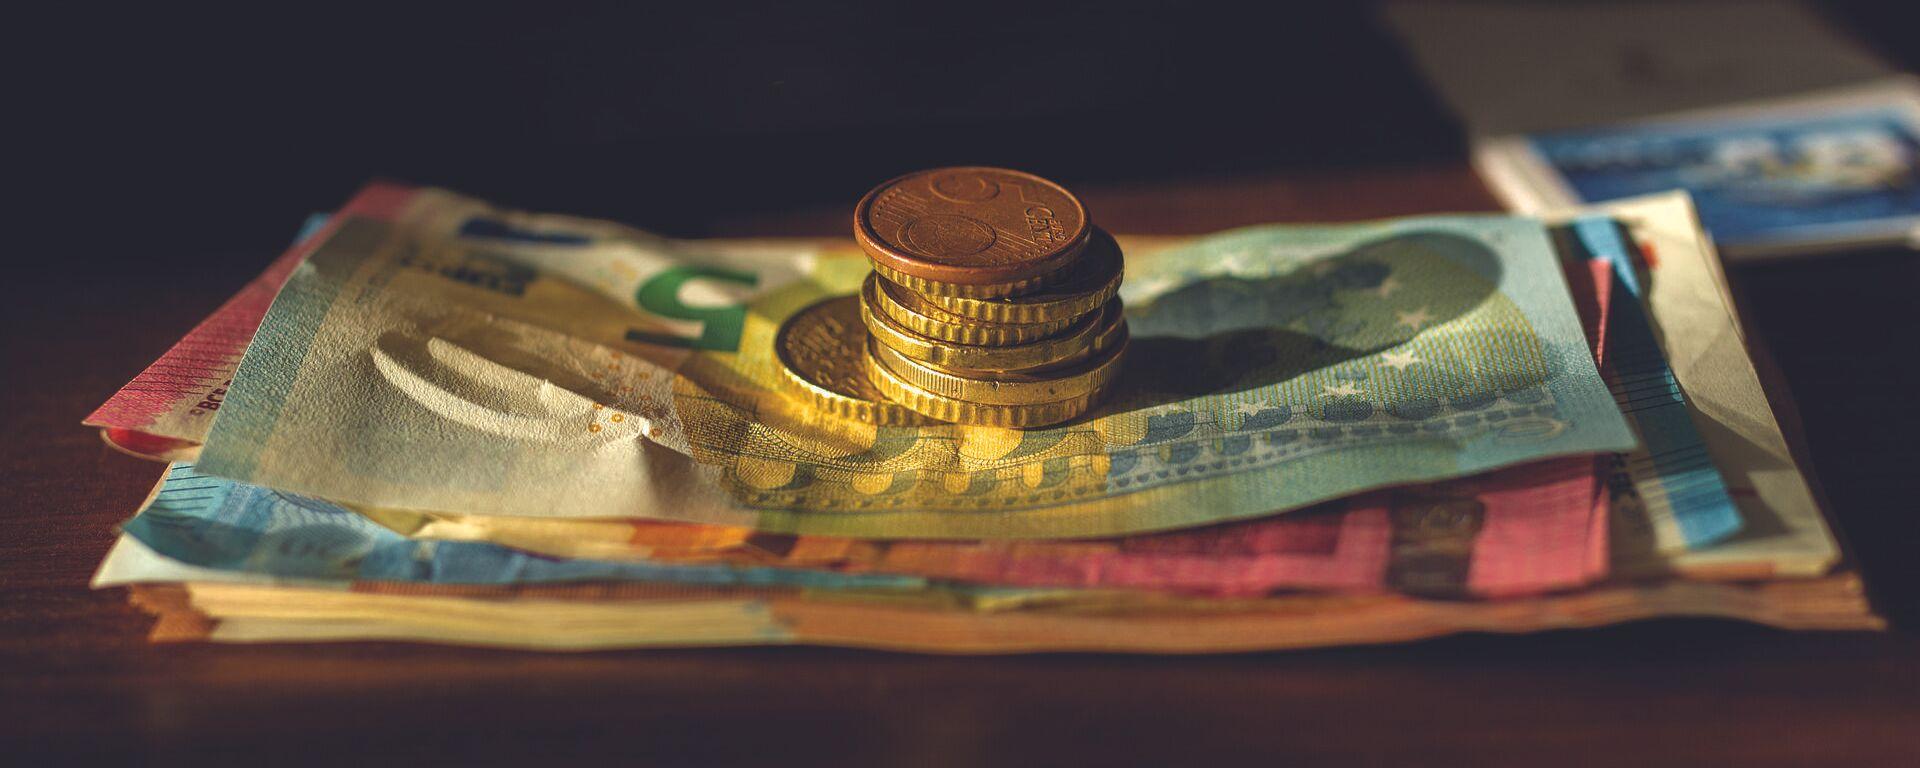 Geld (Symbolbild) - SNA, 1920, 19.07.2021